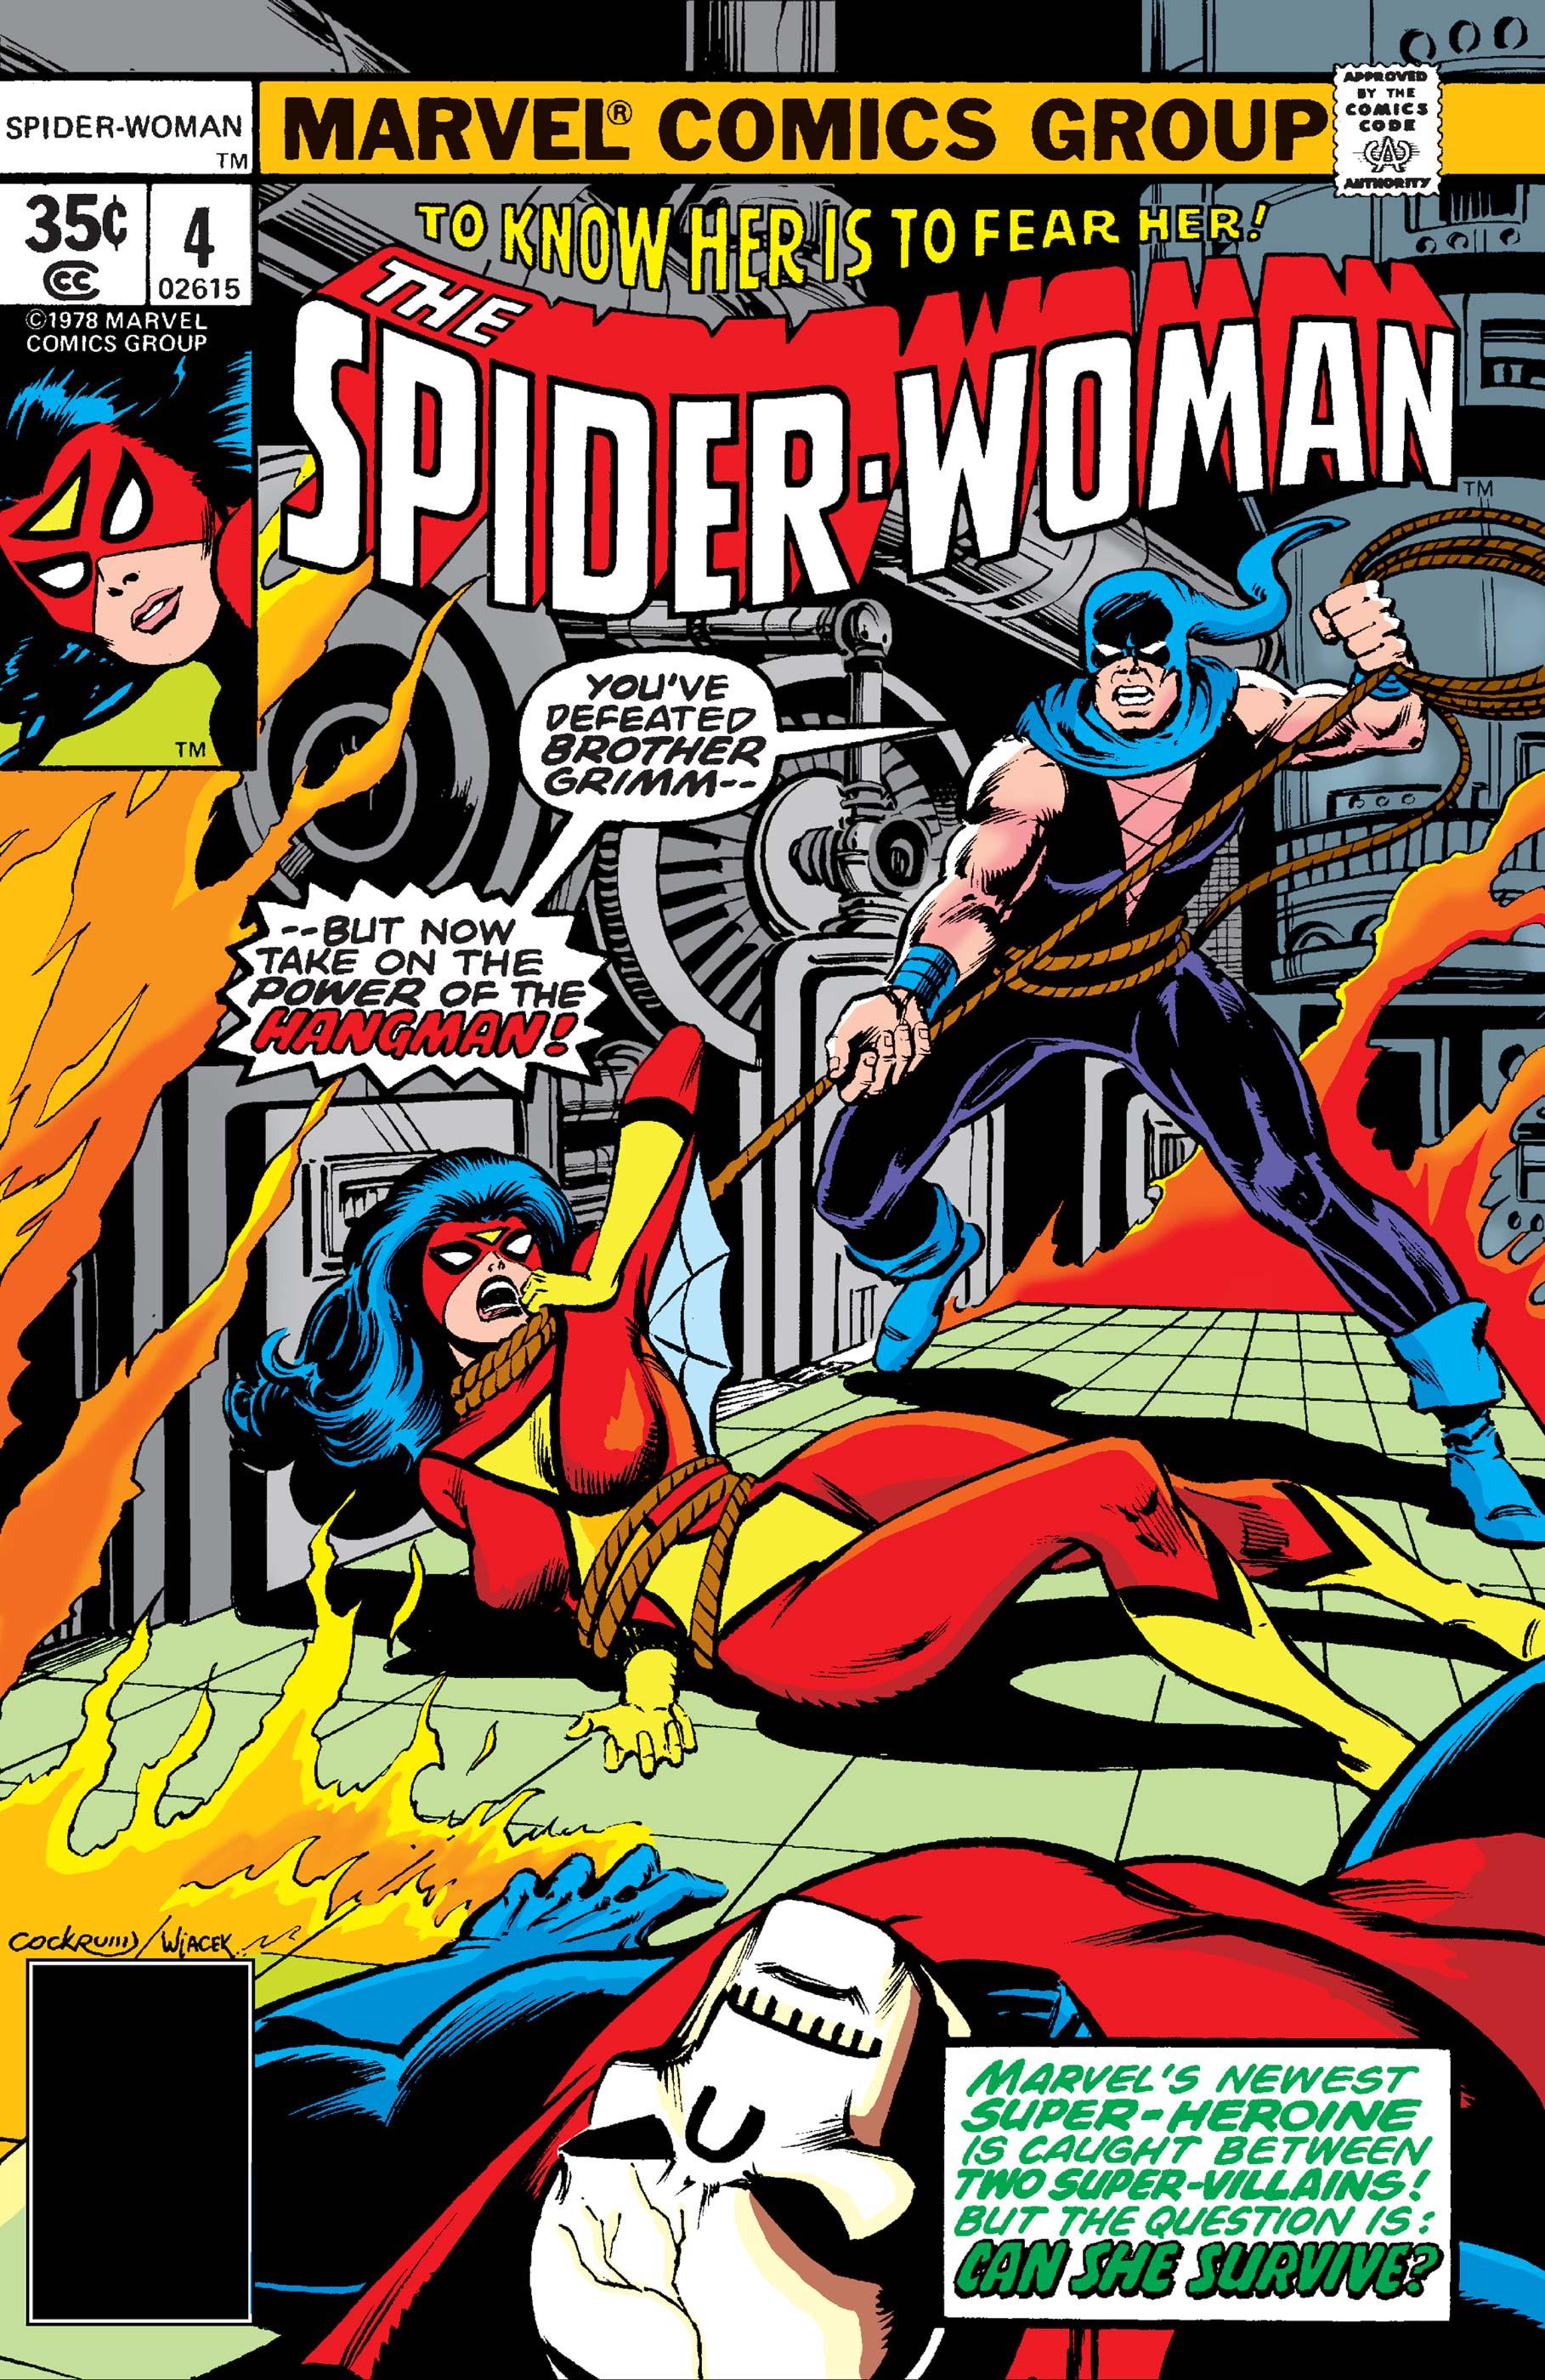 Spider-Woman (1978) #4